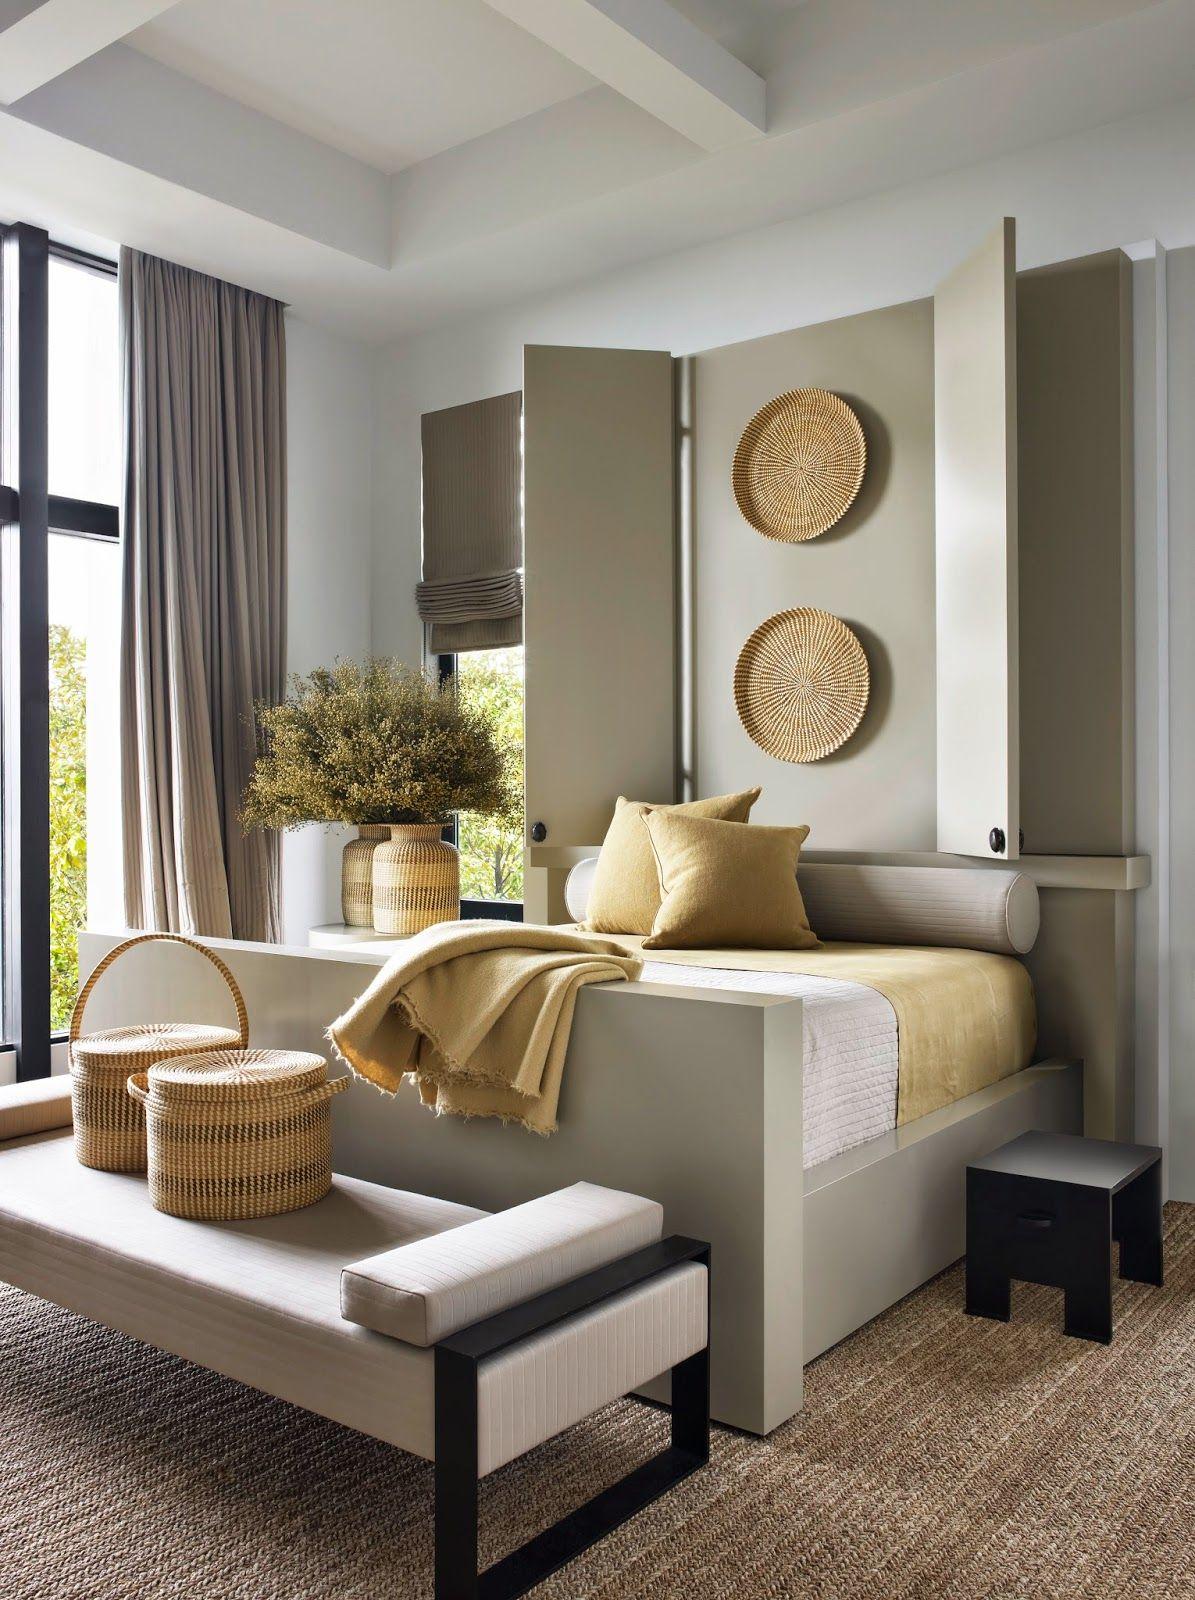 Interior Design Of Guest Room: Intriguing Bed ~ Nancy Braithwaite Design